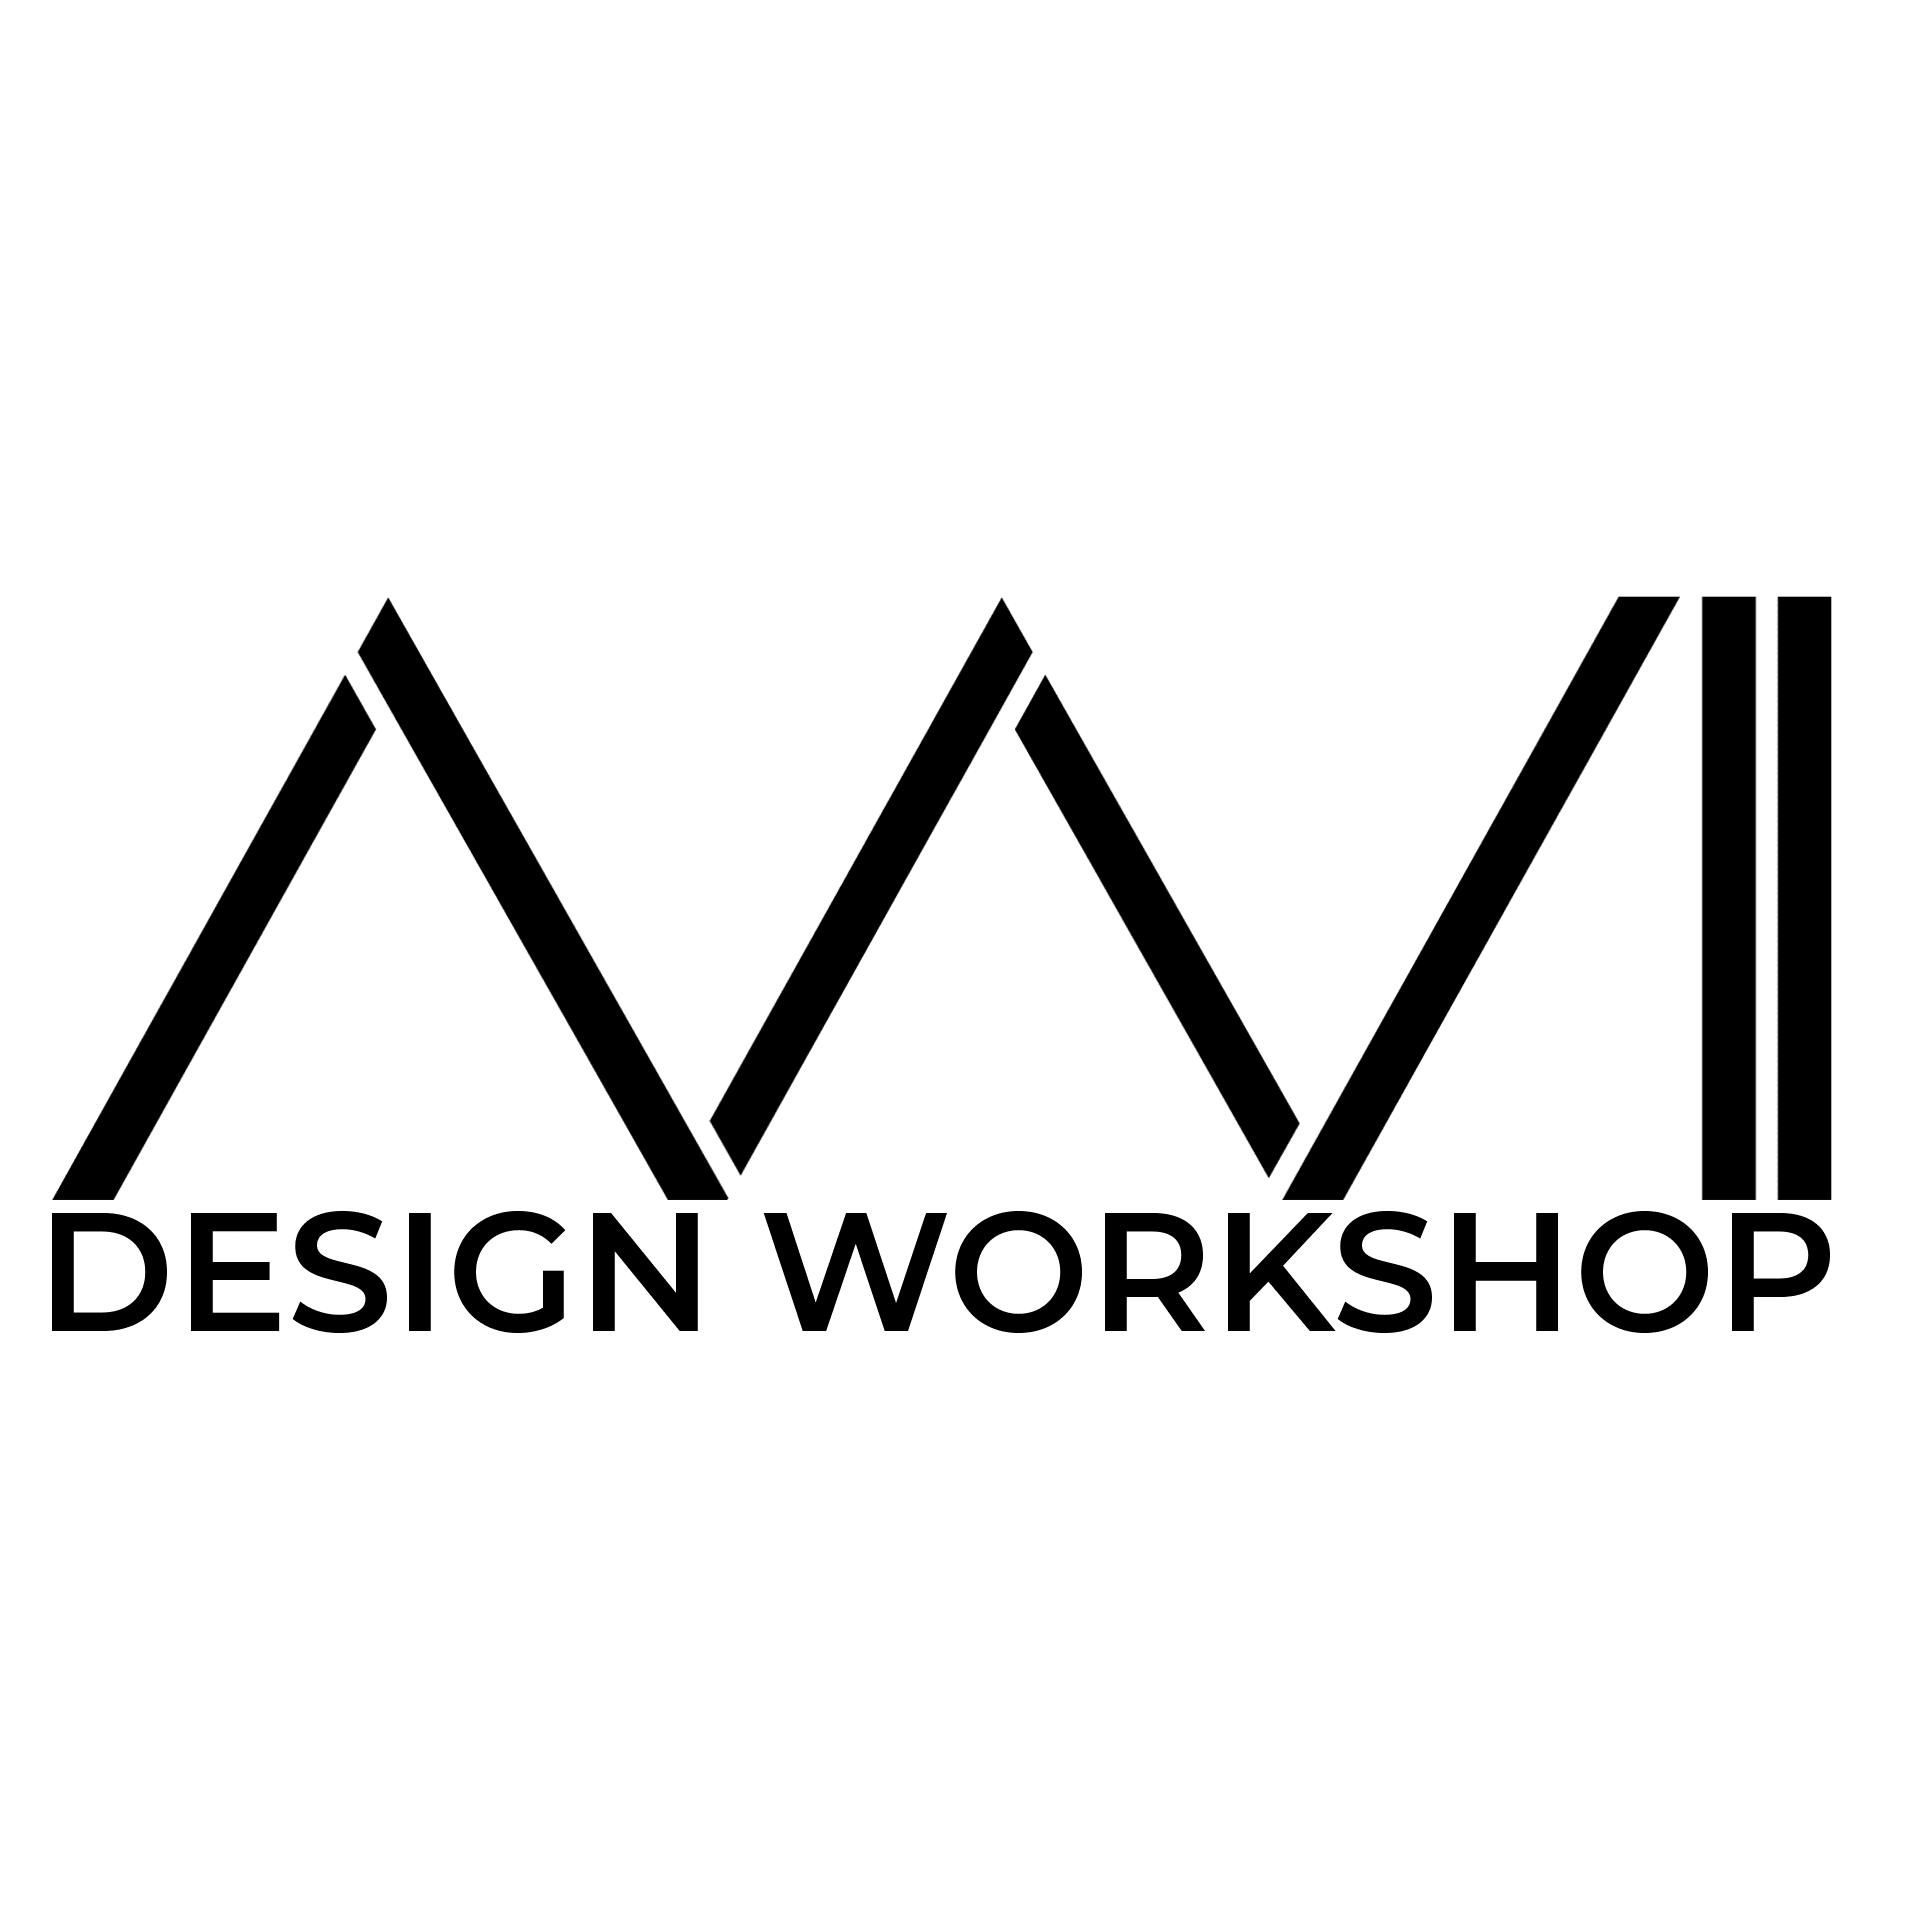 Aa7 Design Workshop